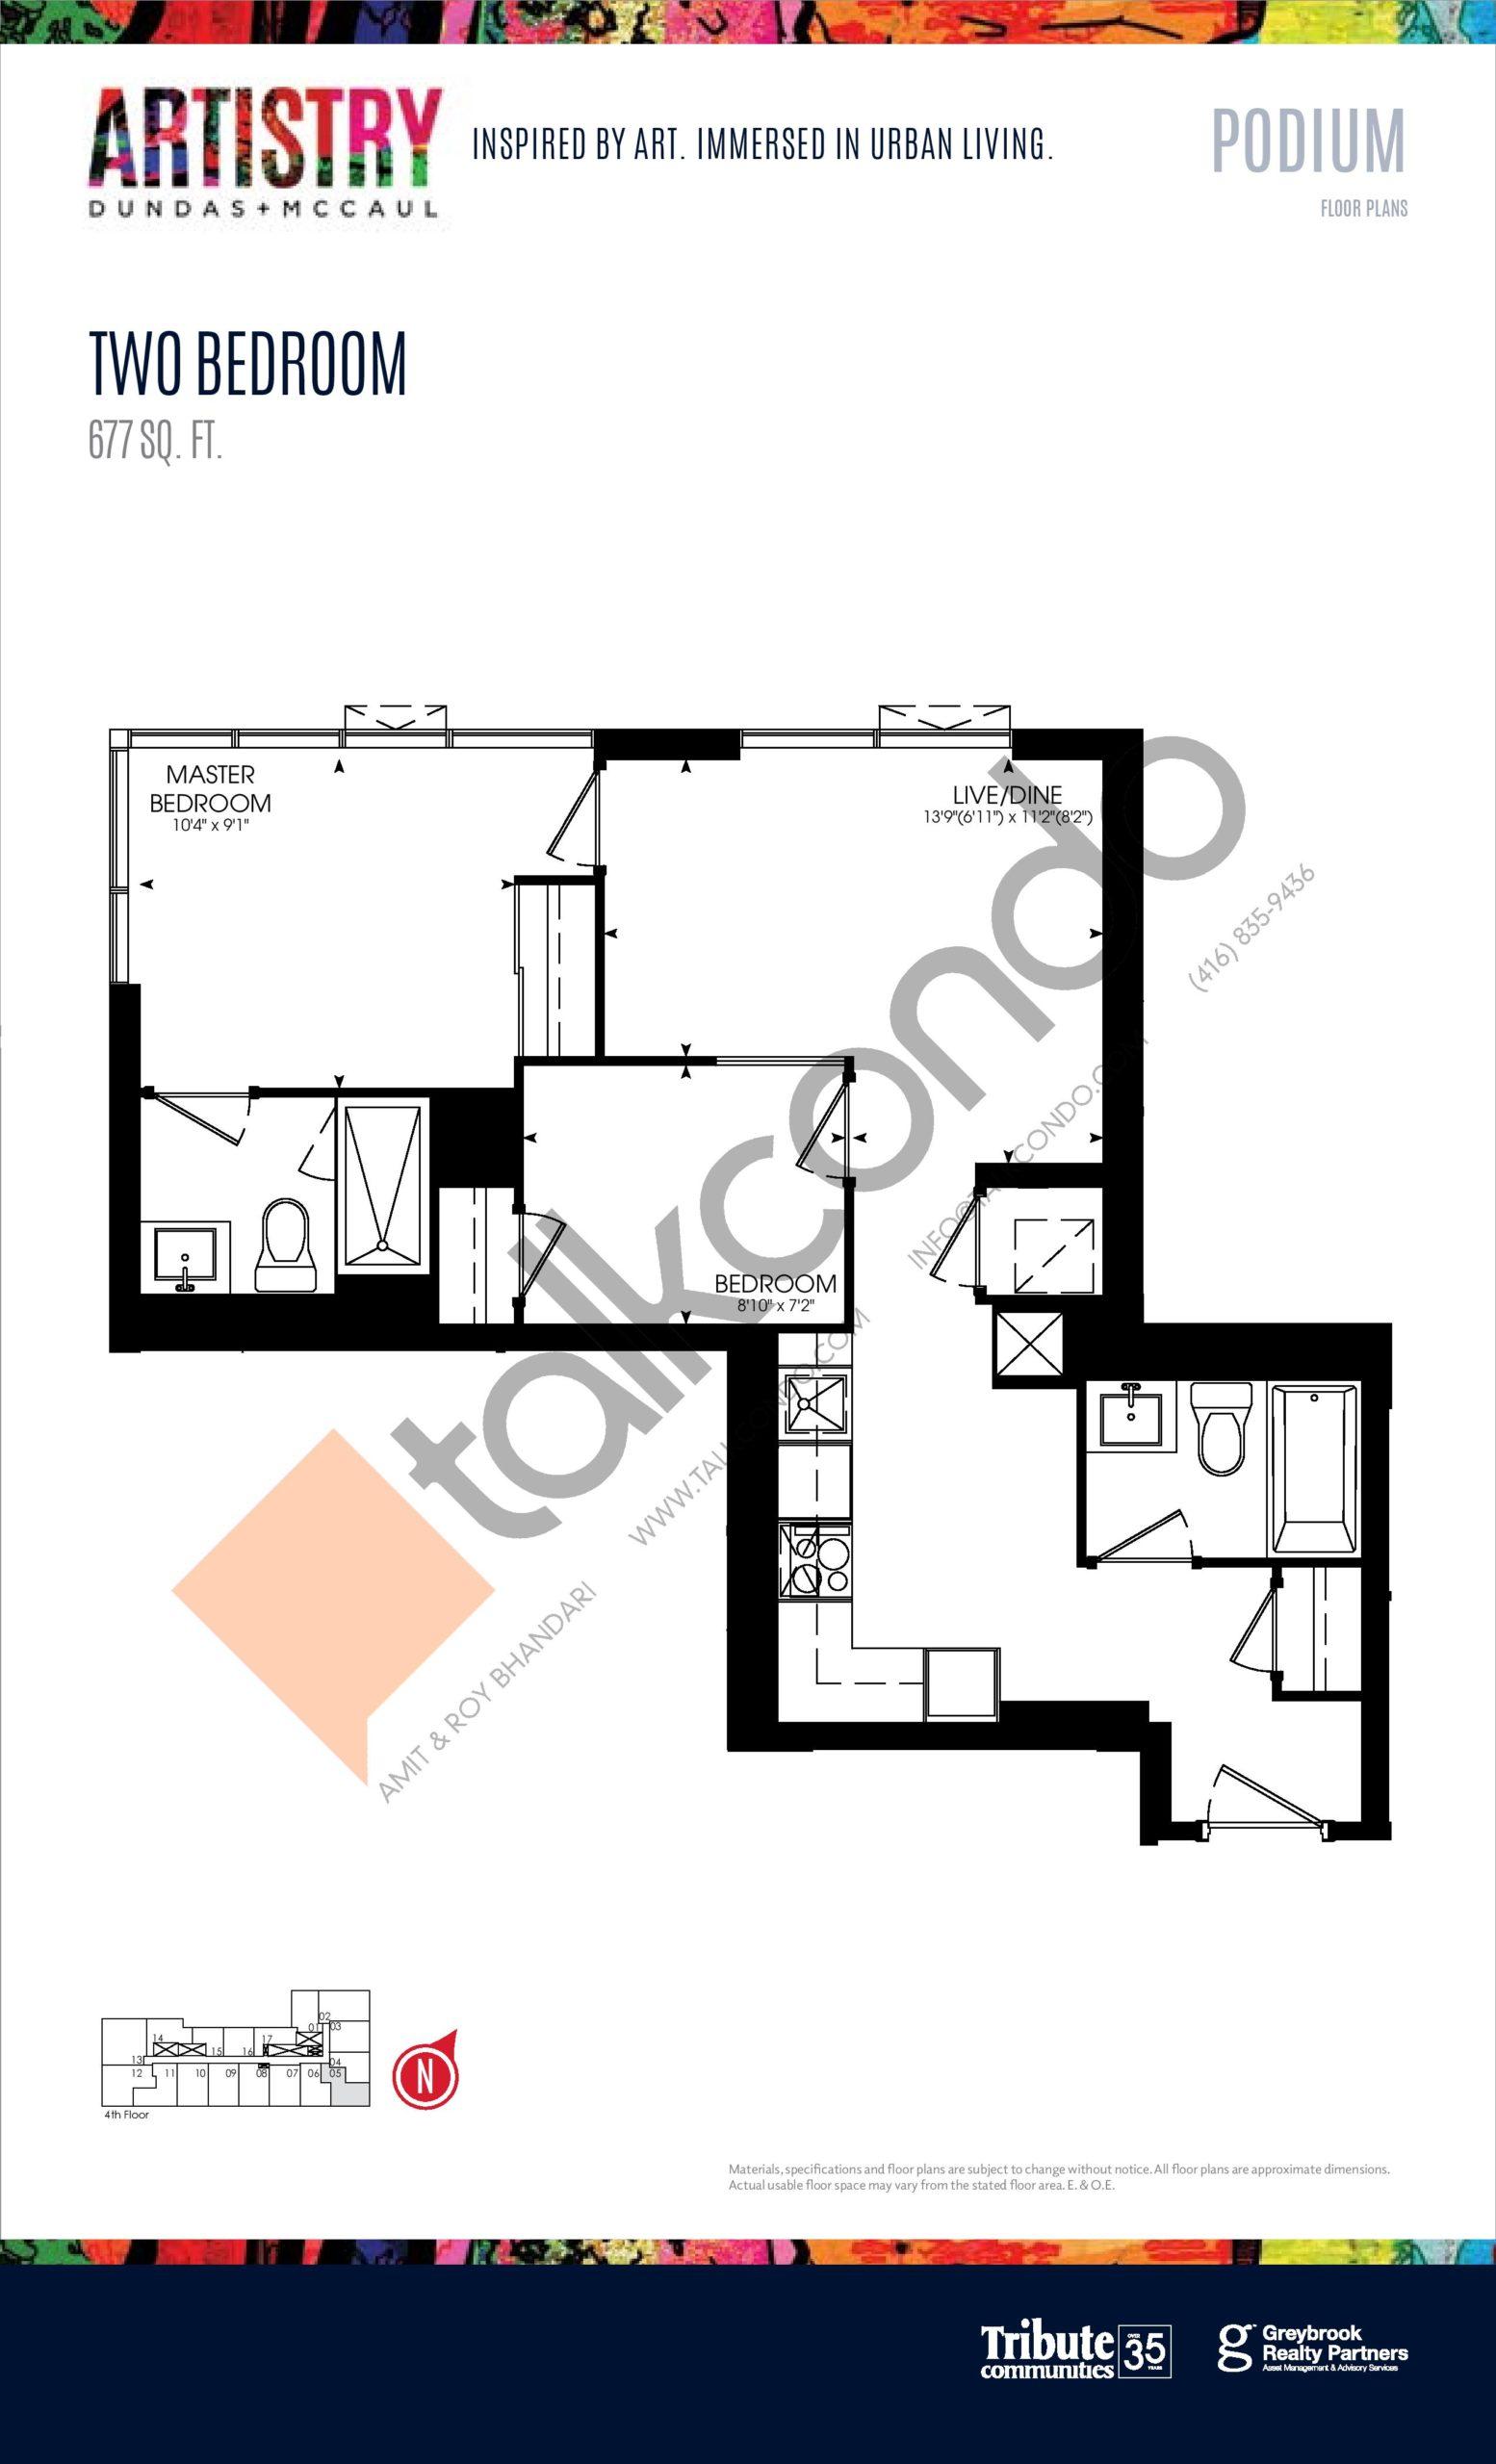 677 sq. ft. - Podium Floor Plan at Artistry Condos - 677 sq.ft